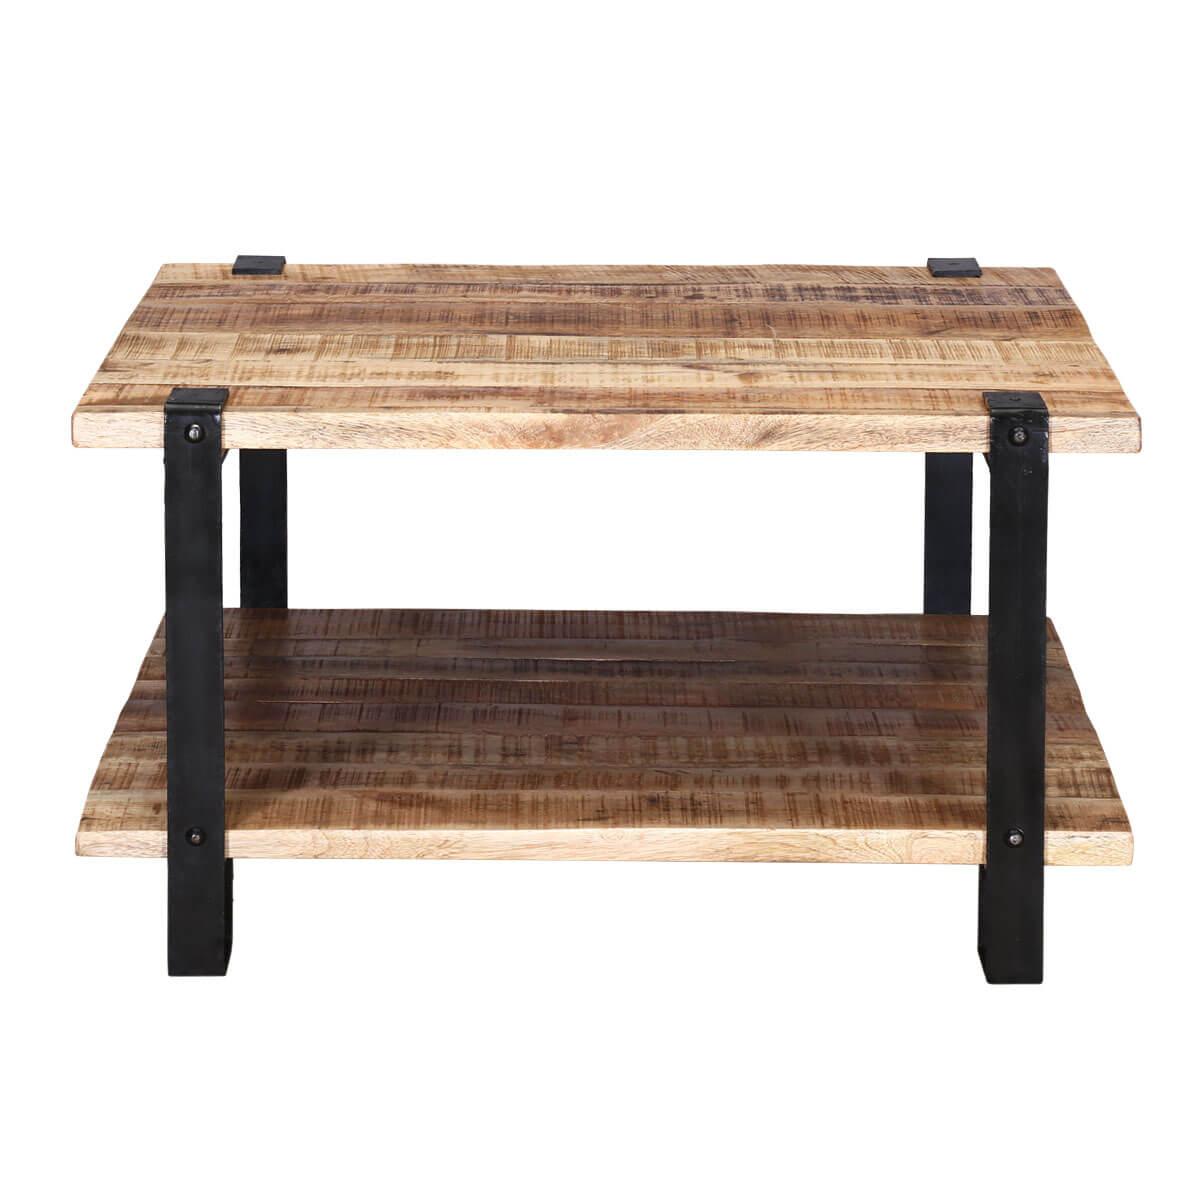 Roxborough Rustic Industrial Square Coffee Table With Saw Marks - Rustic Industrial Square Coffee Table With Saw Marks